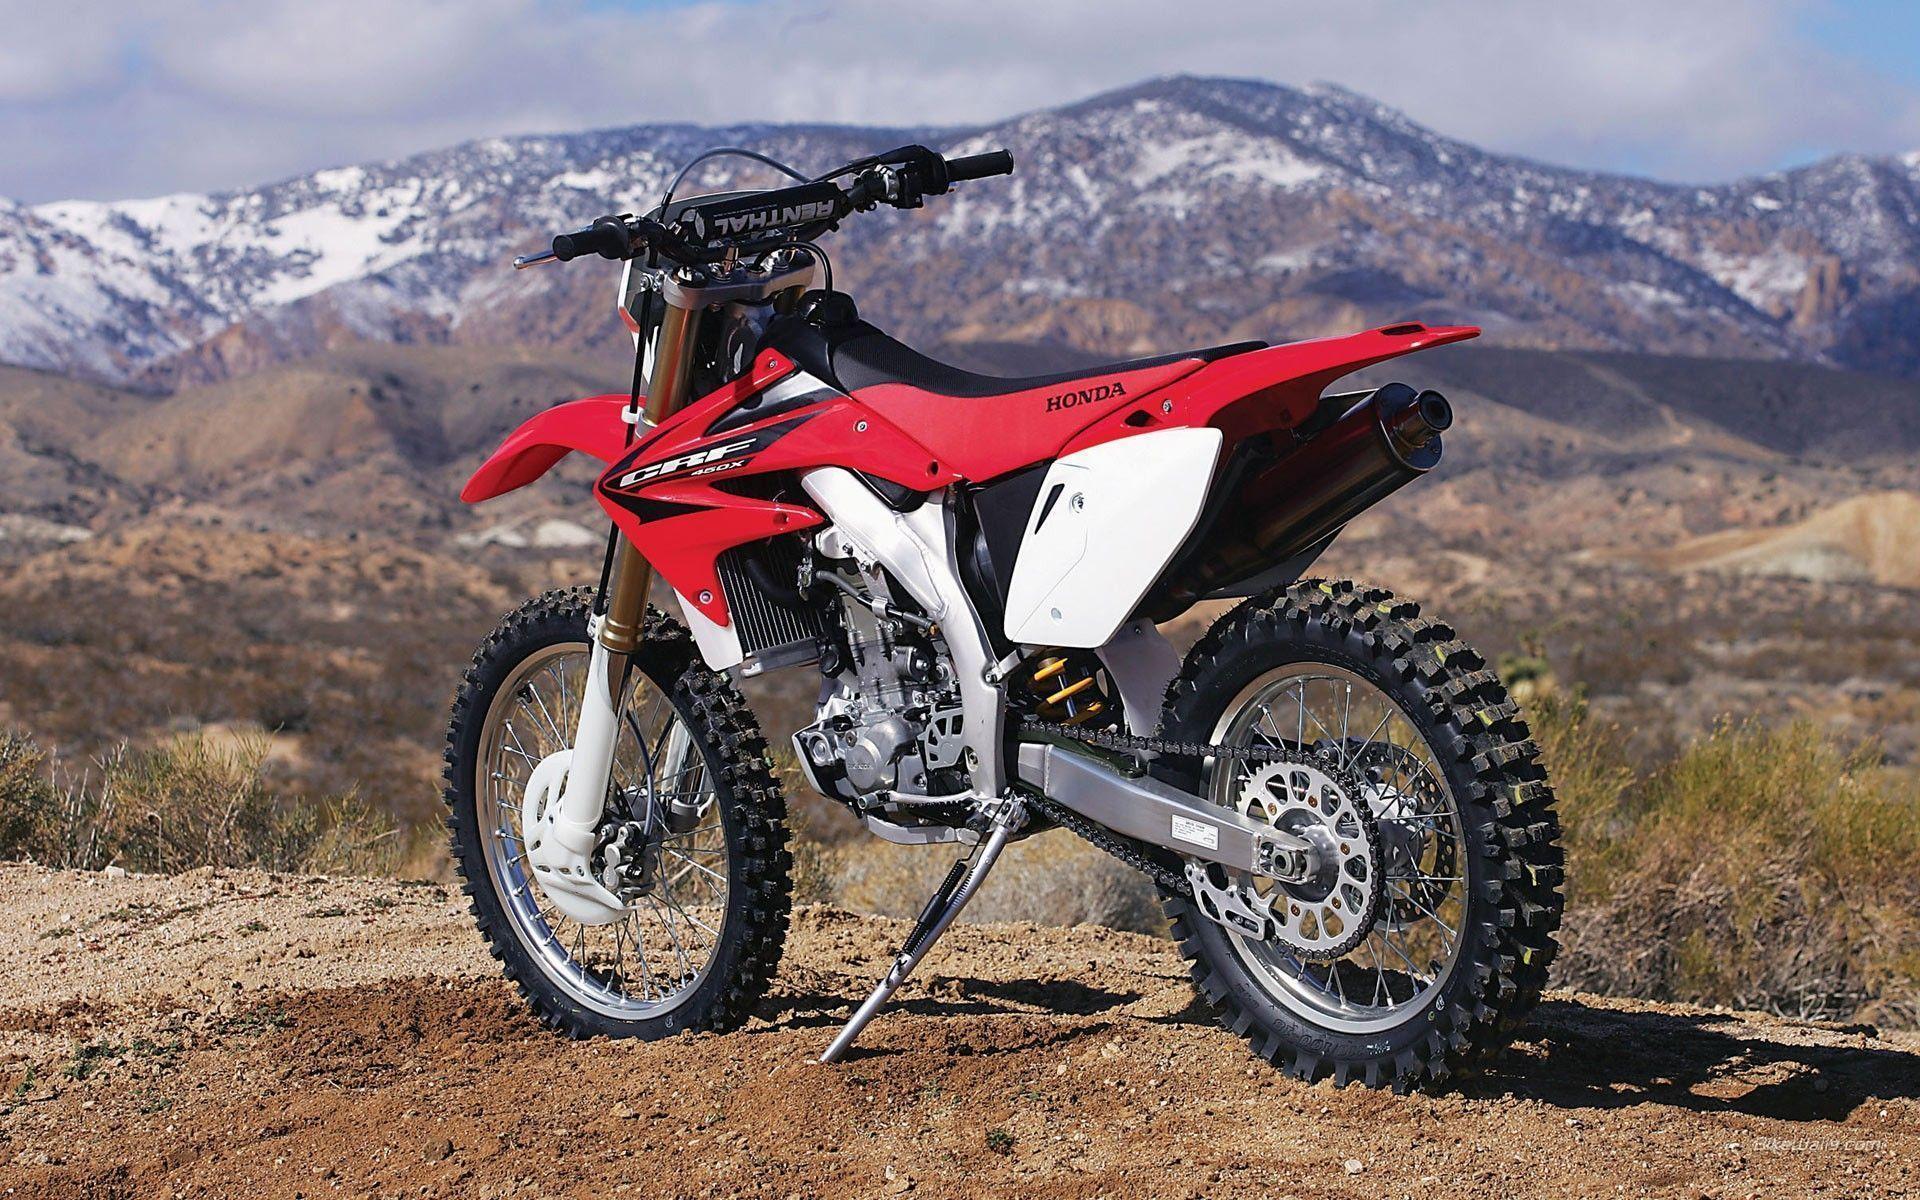 Dirt Bikes Wallpapers Wallpaper Cave Honda Motocross Hd Mini 1515 X 934 132 Kb Jpeg